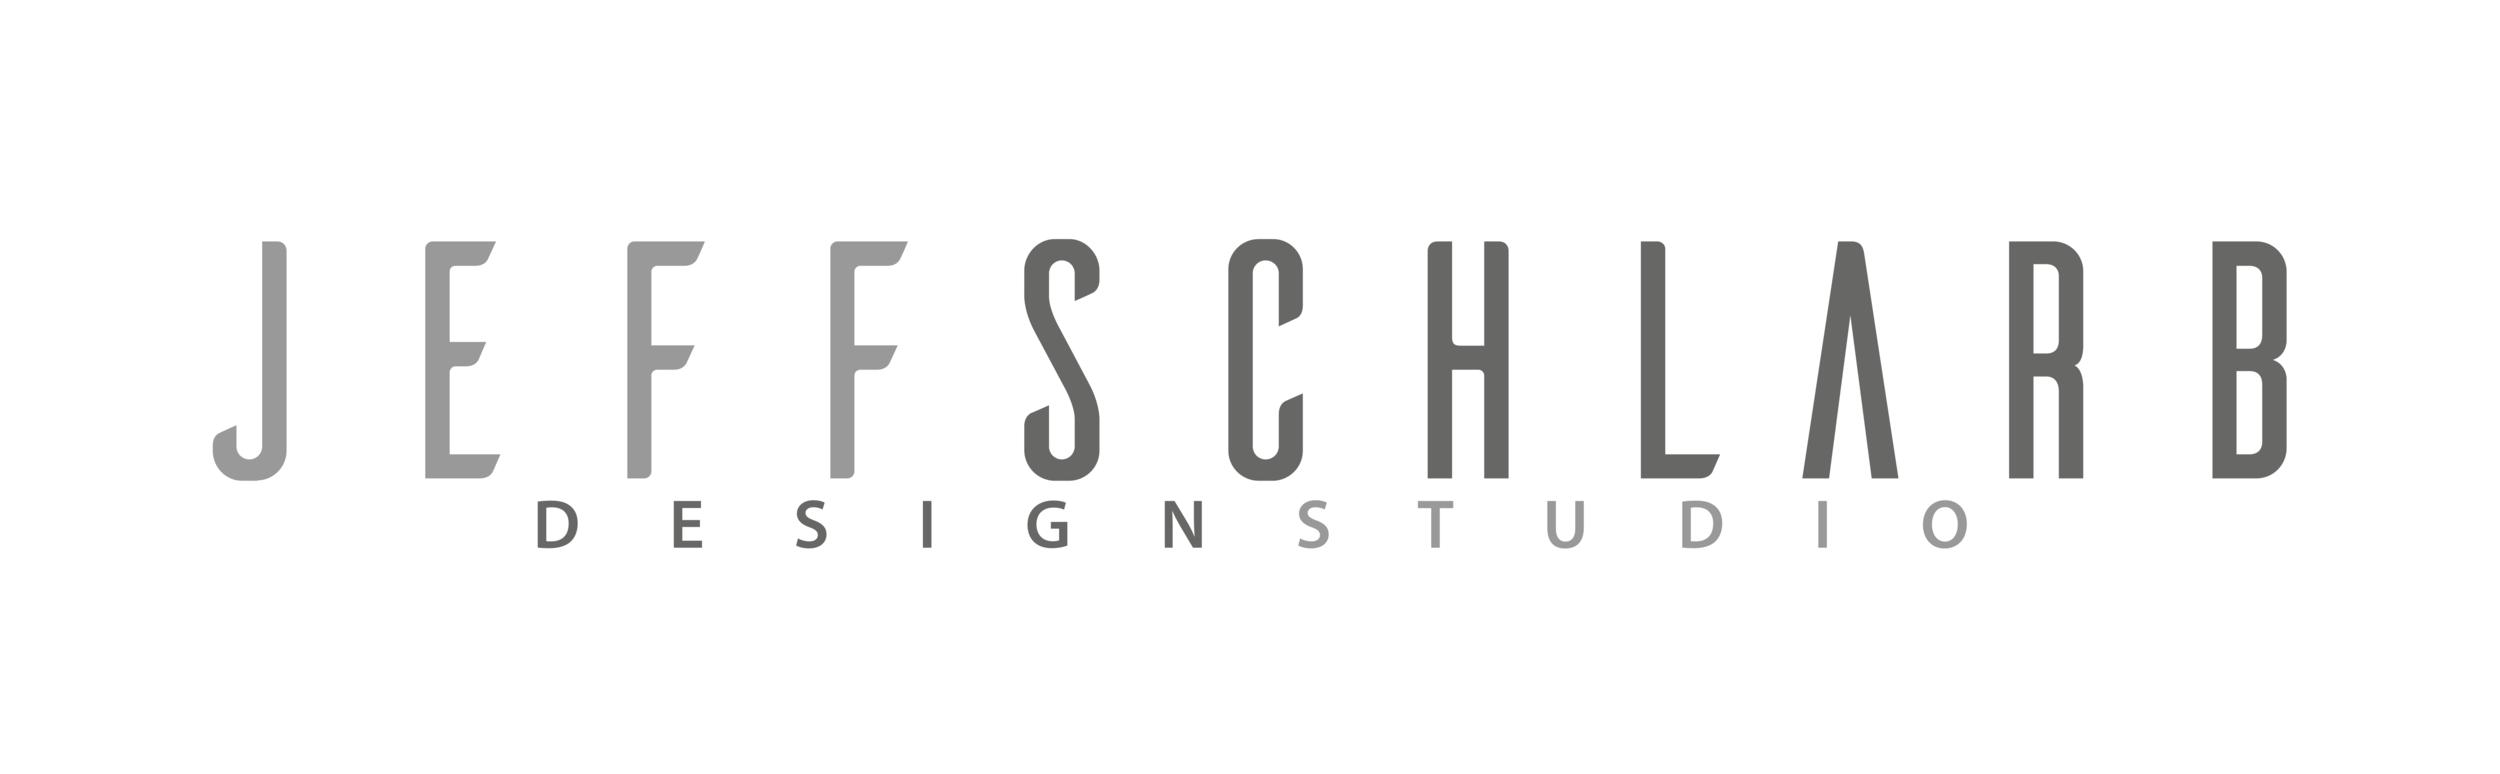 jeff-schlarb-logo.png